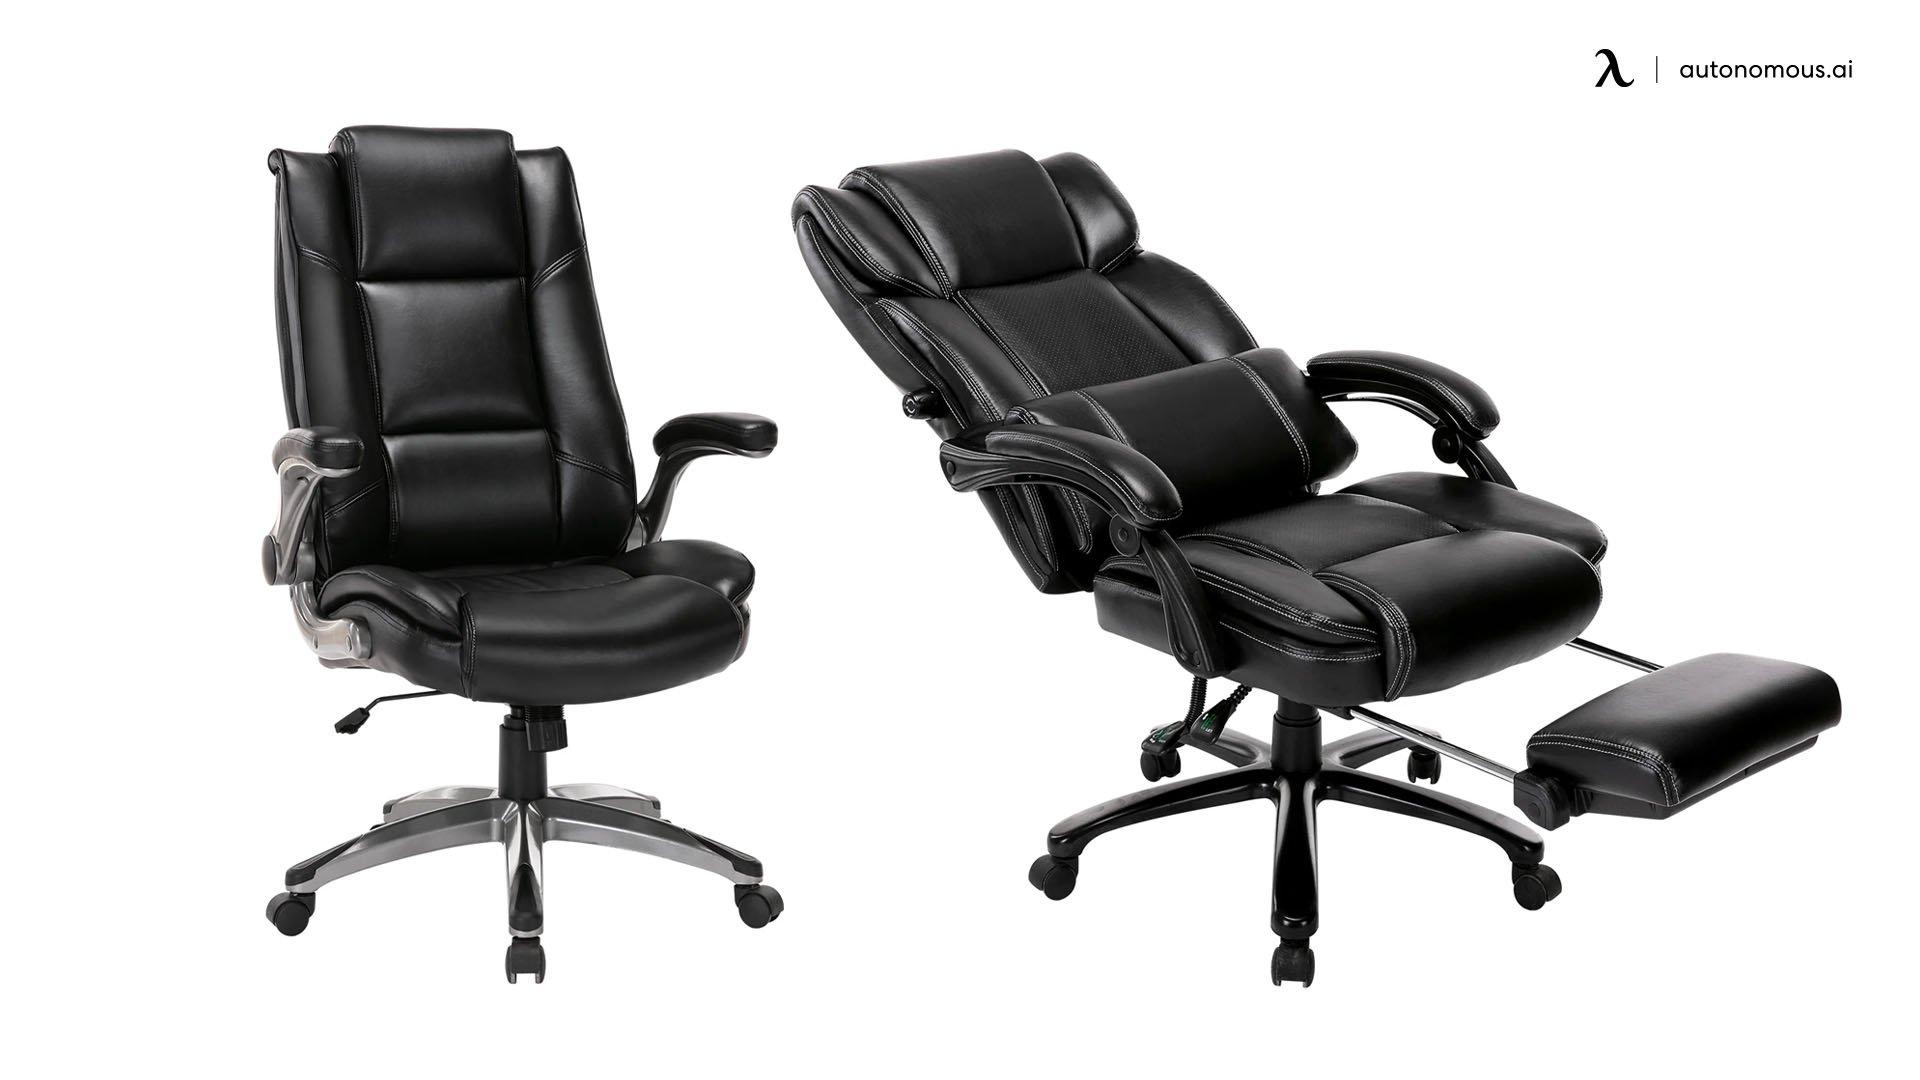 Starspace Ergonomic Chair